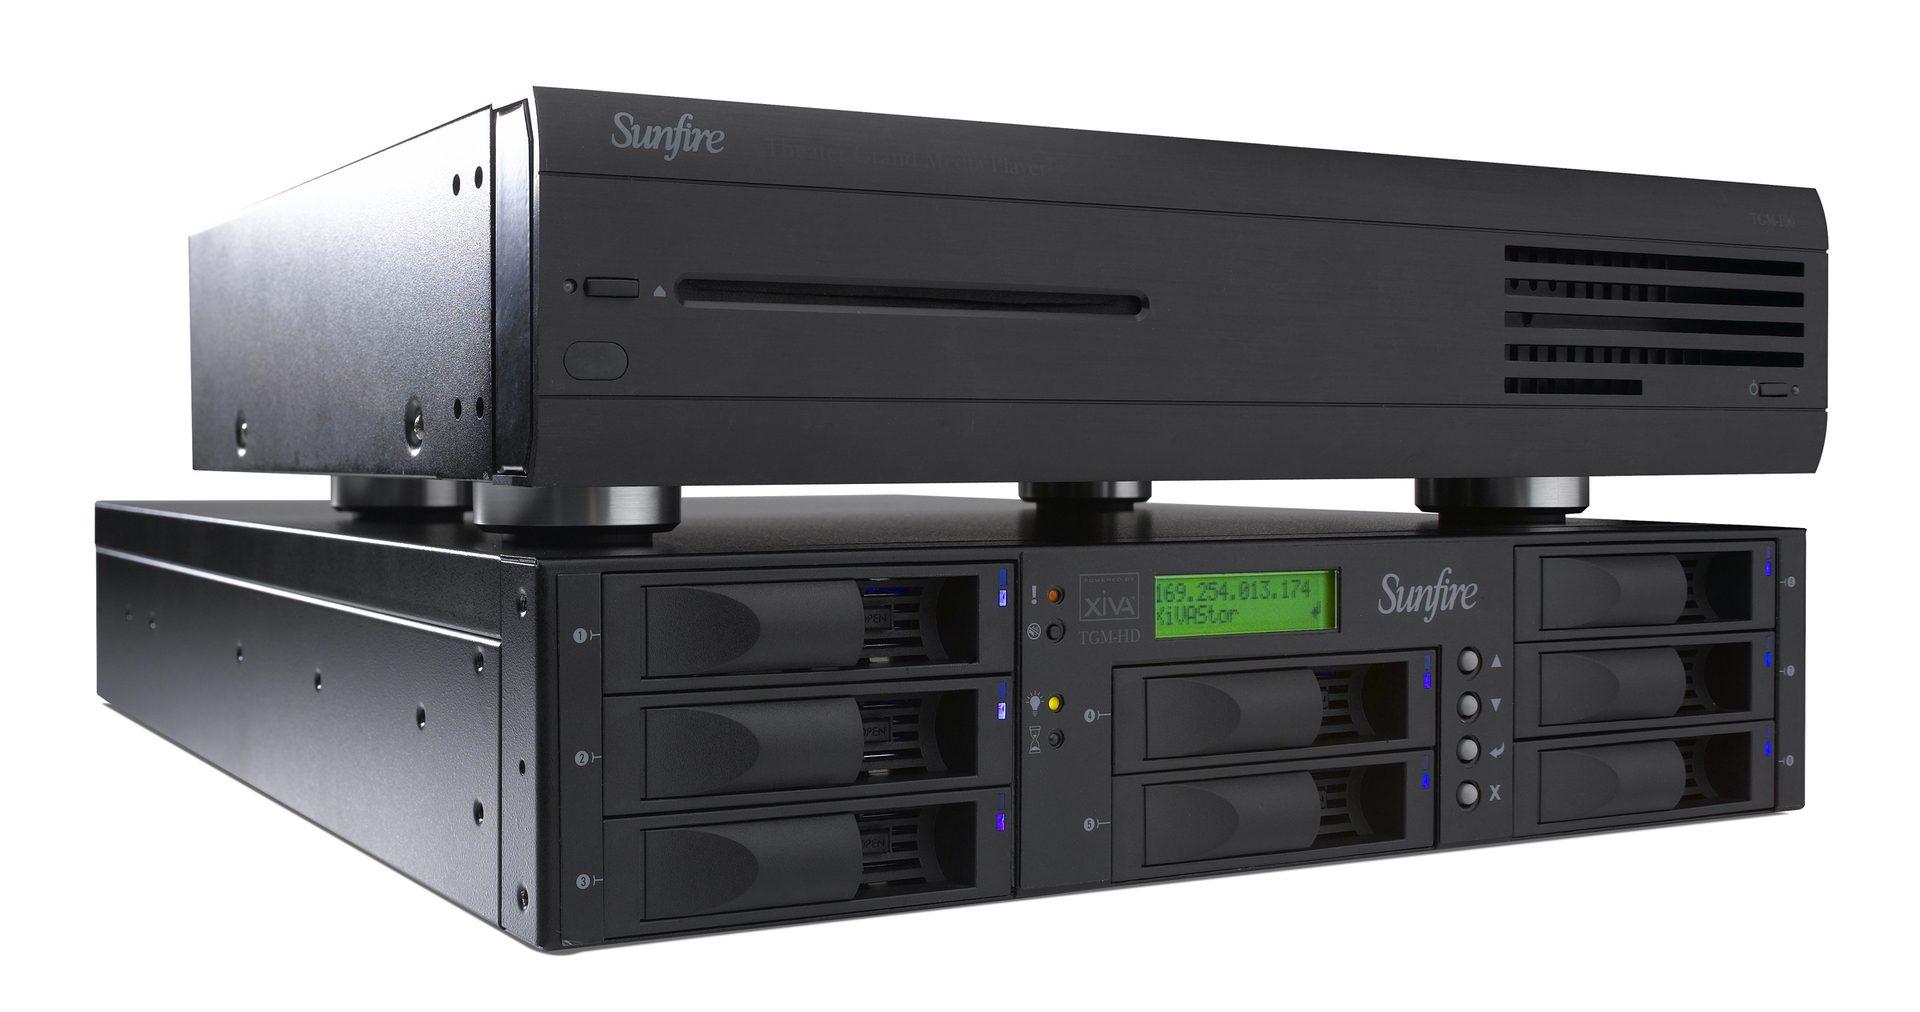 Sunfire Launches TGM-100 Media Server & TGM-HD Series Storage Arrays